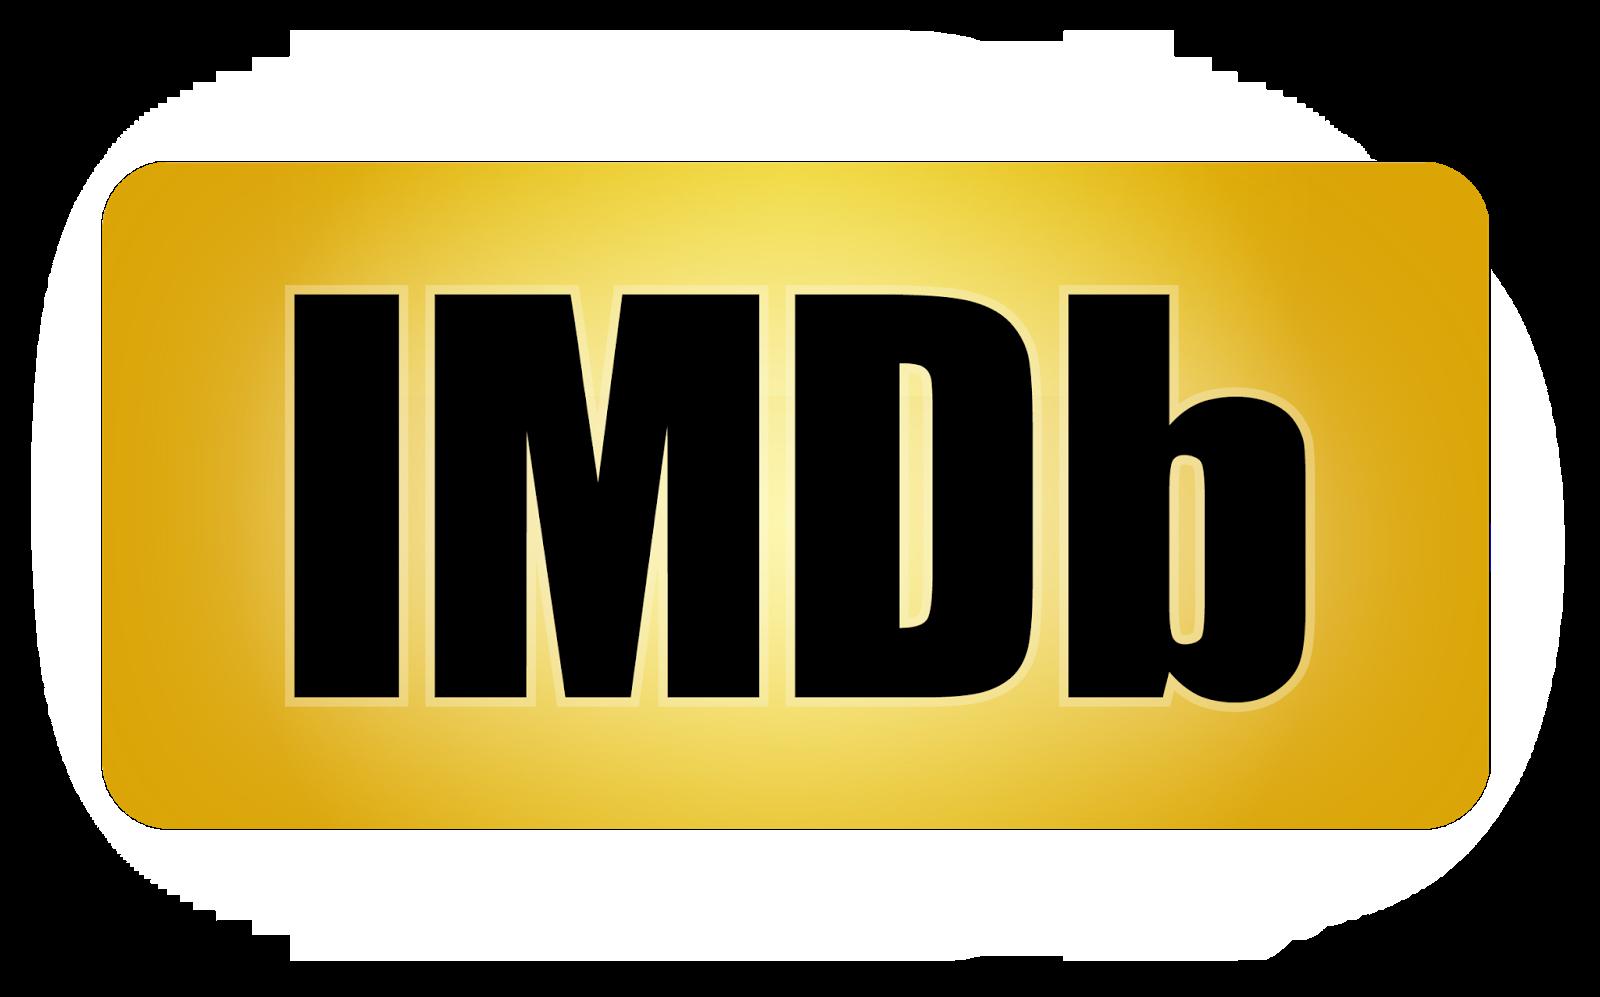 http://www.imdb.com/name/nm3610745/?ref_=fn_al_nm_1